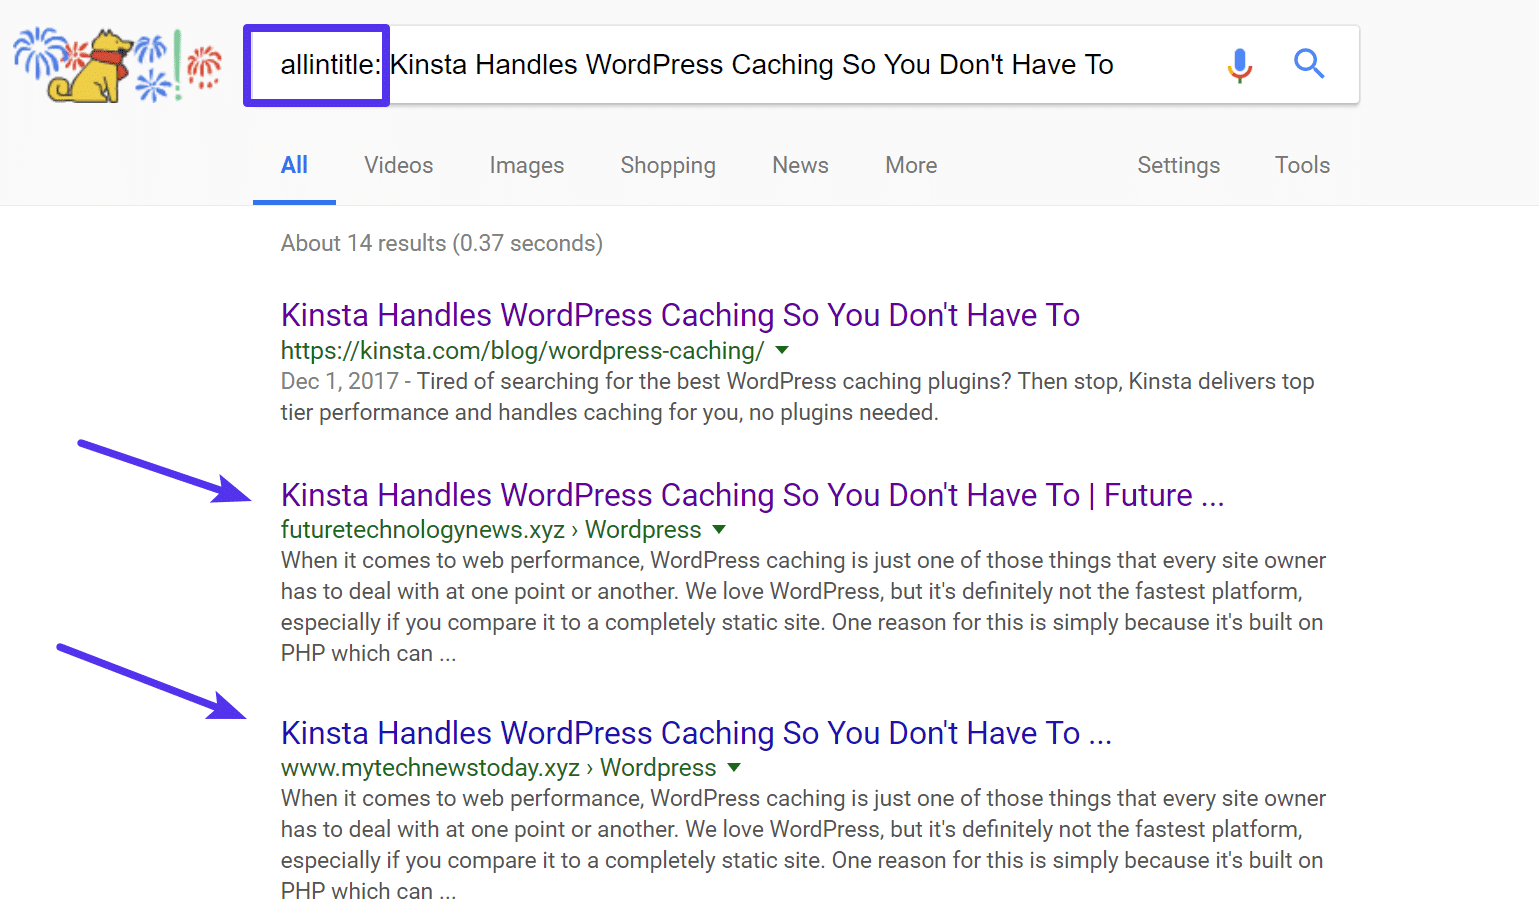 Recherche Google avec balise allintitle